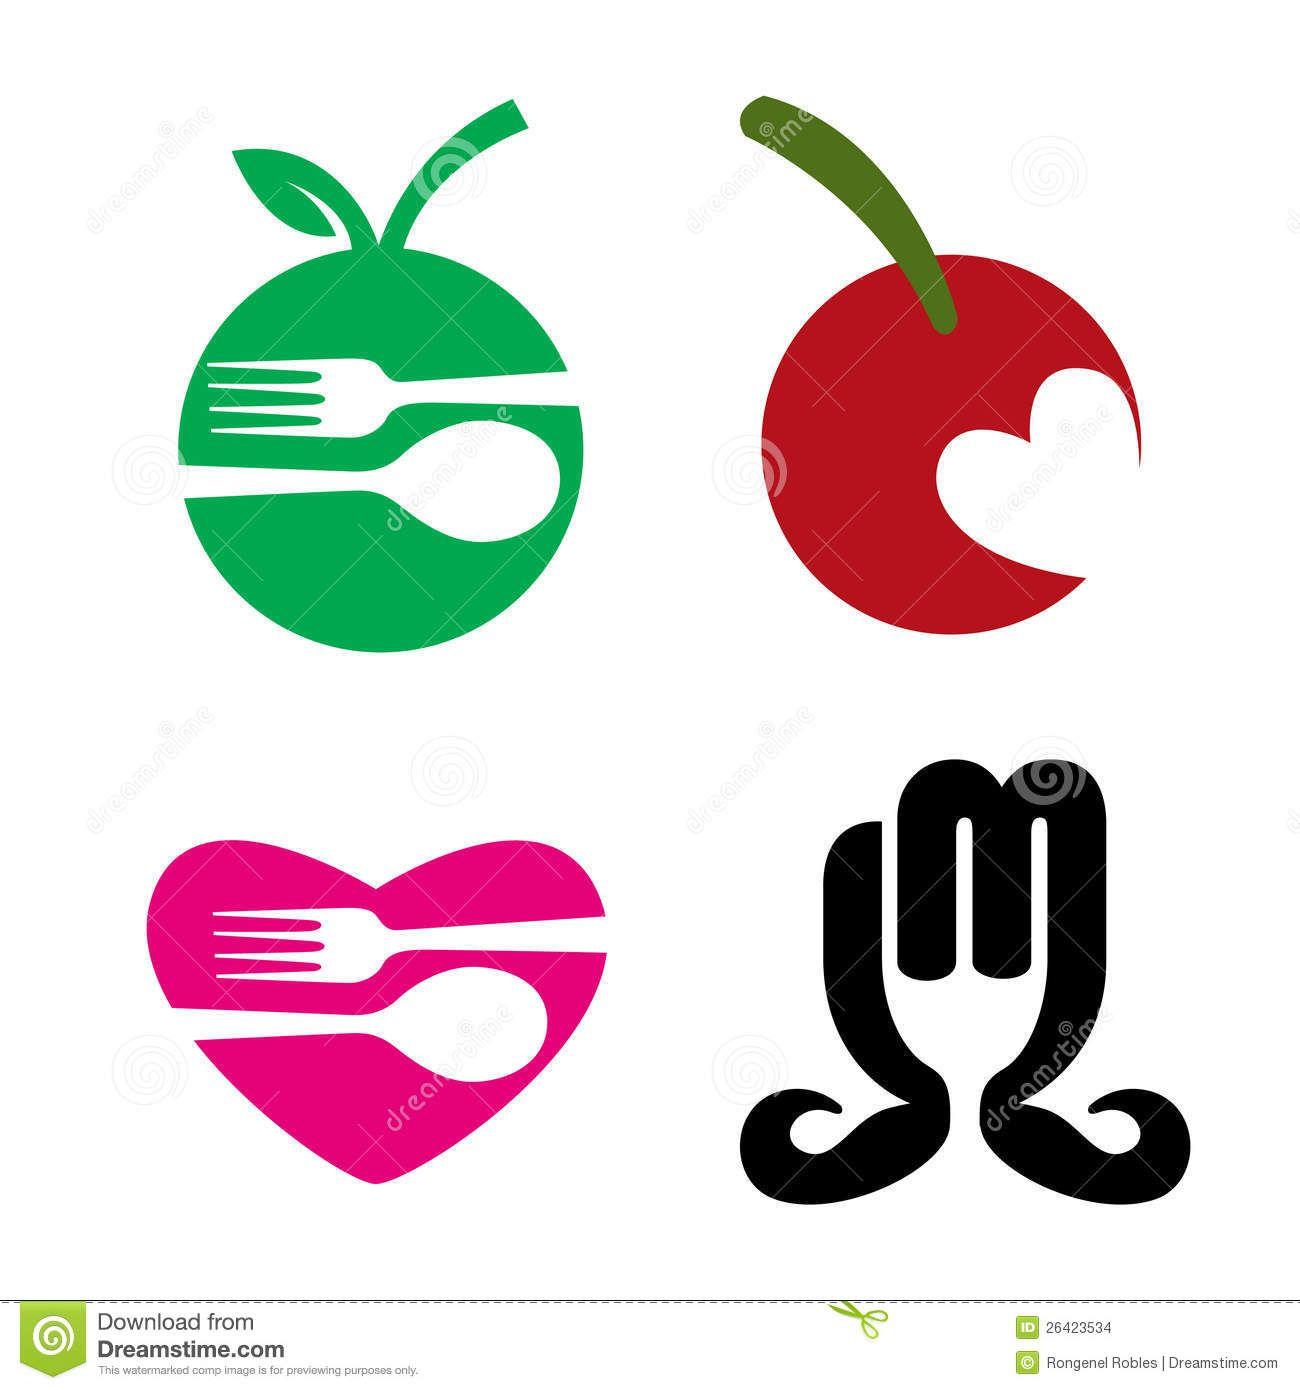 food industry logo stock vector image 47928279 food trends rh pinterest ca food industry logos and names best food industry logos